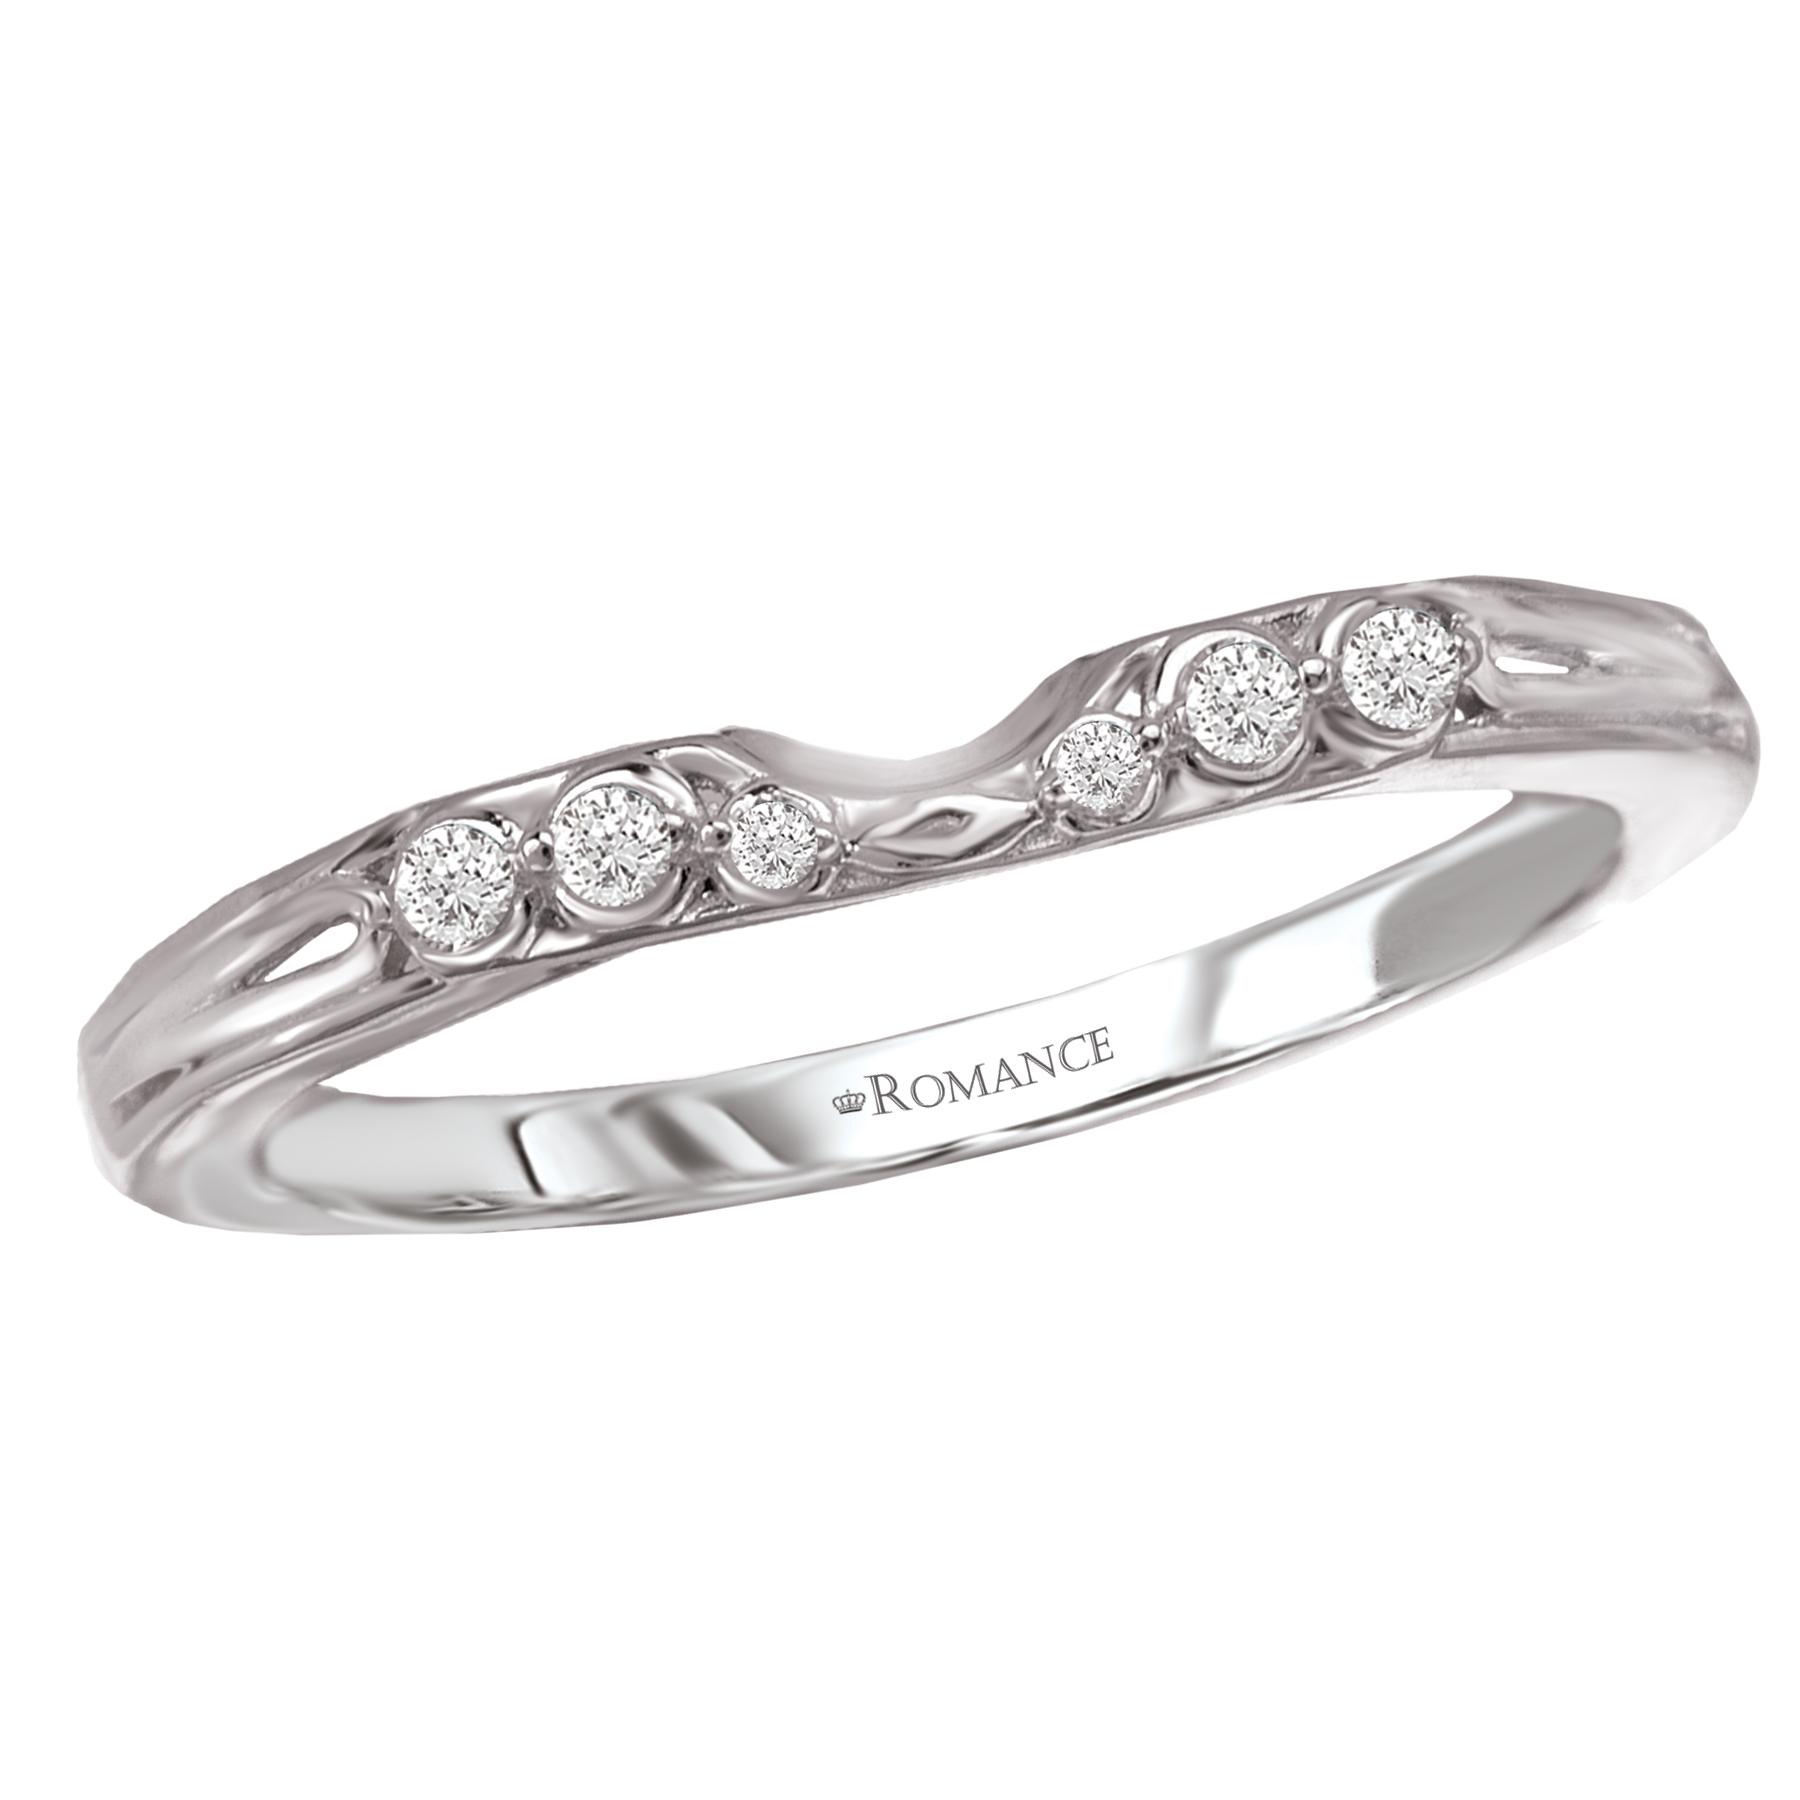 Romance Wedding Bands 117555-100W product image